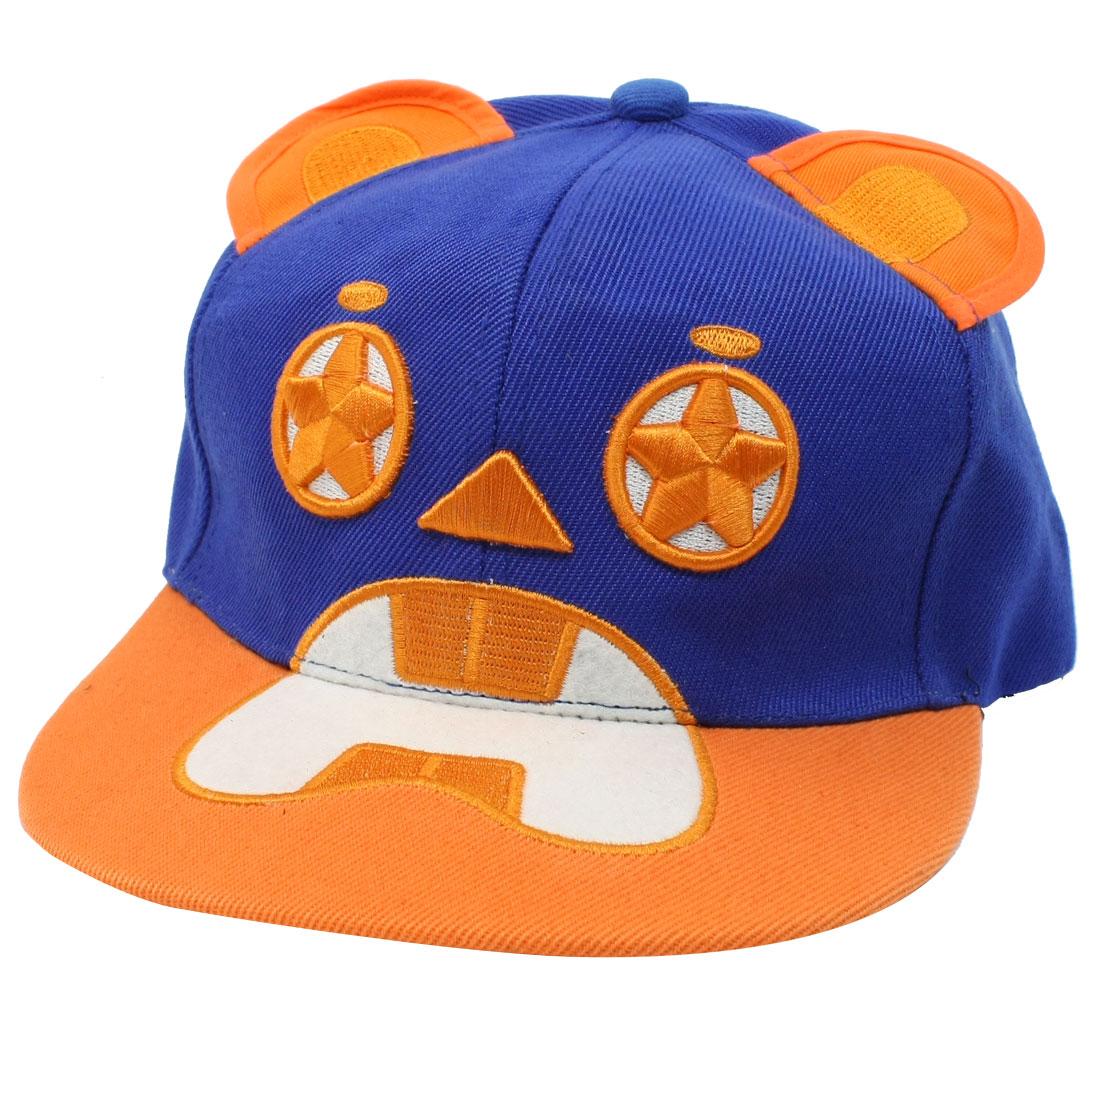 Ladies Man Bear Shaped Adjustable Ball Cap Sun Visor Hat Blue Orange